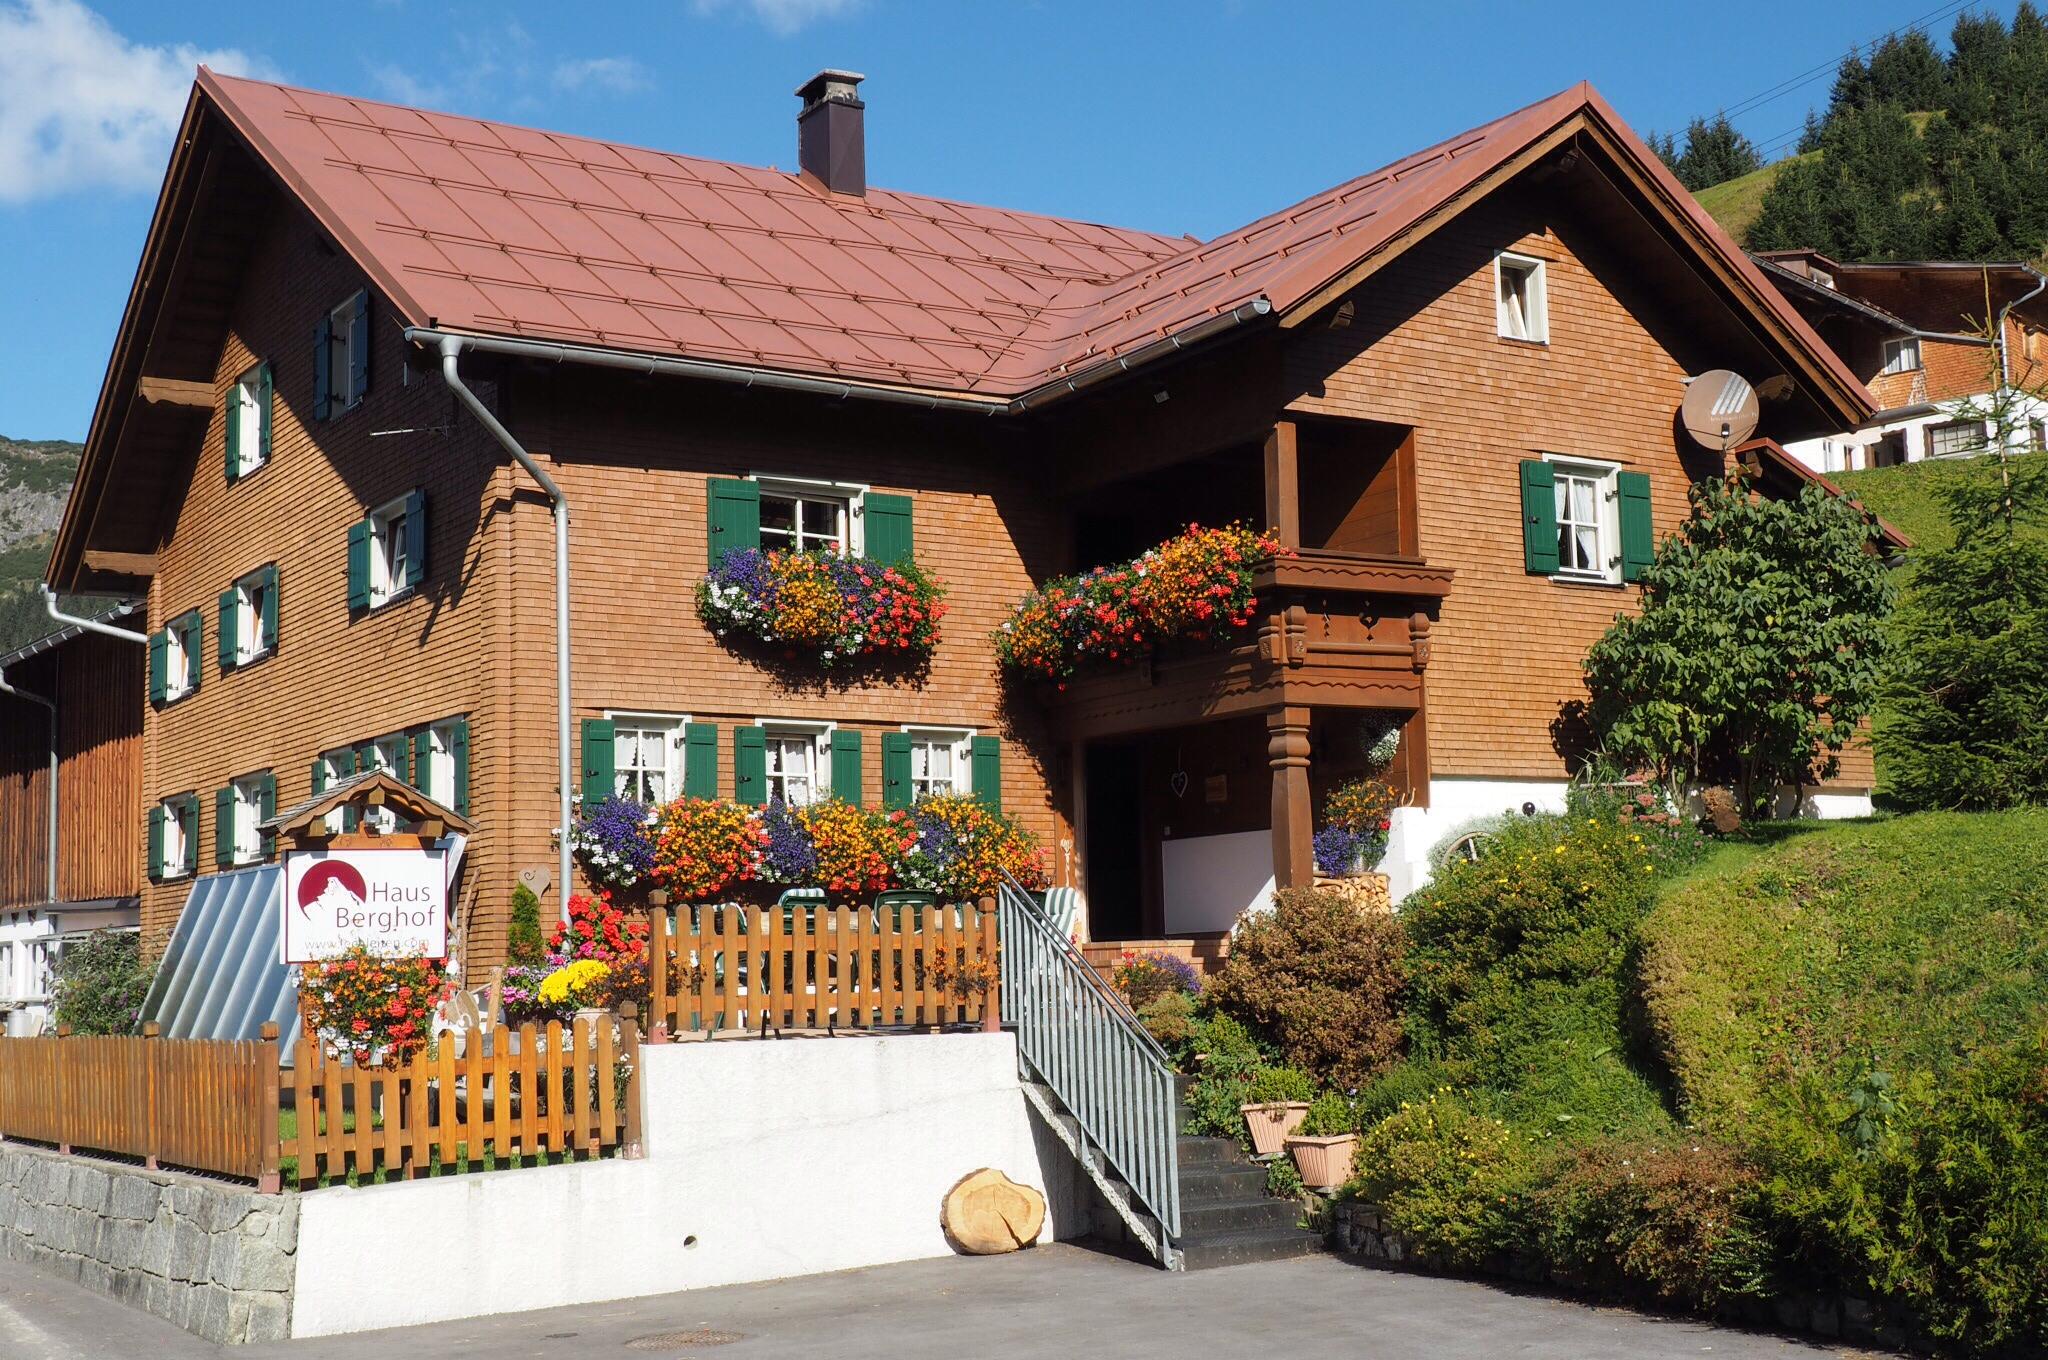 Haus Berghof.jpg